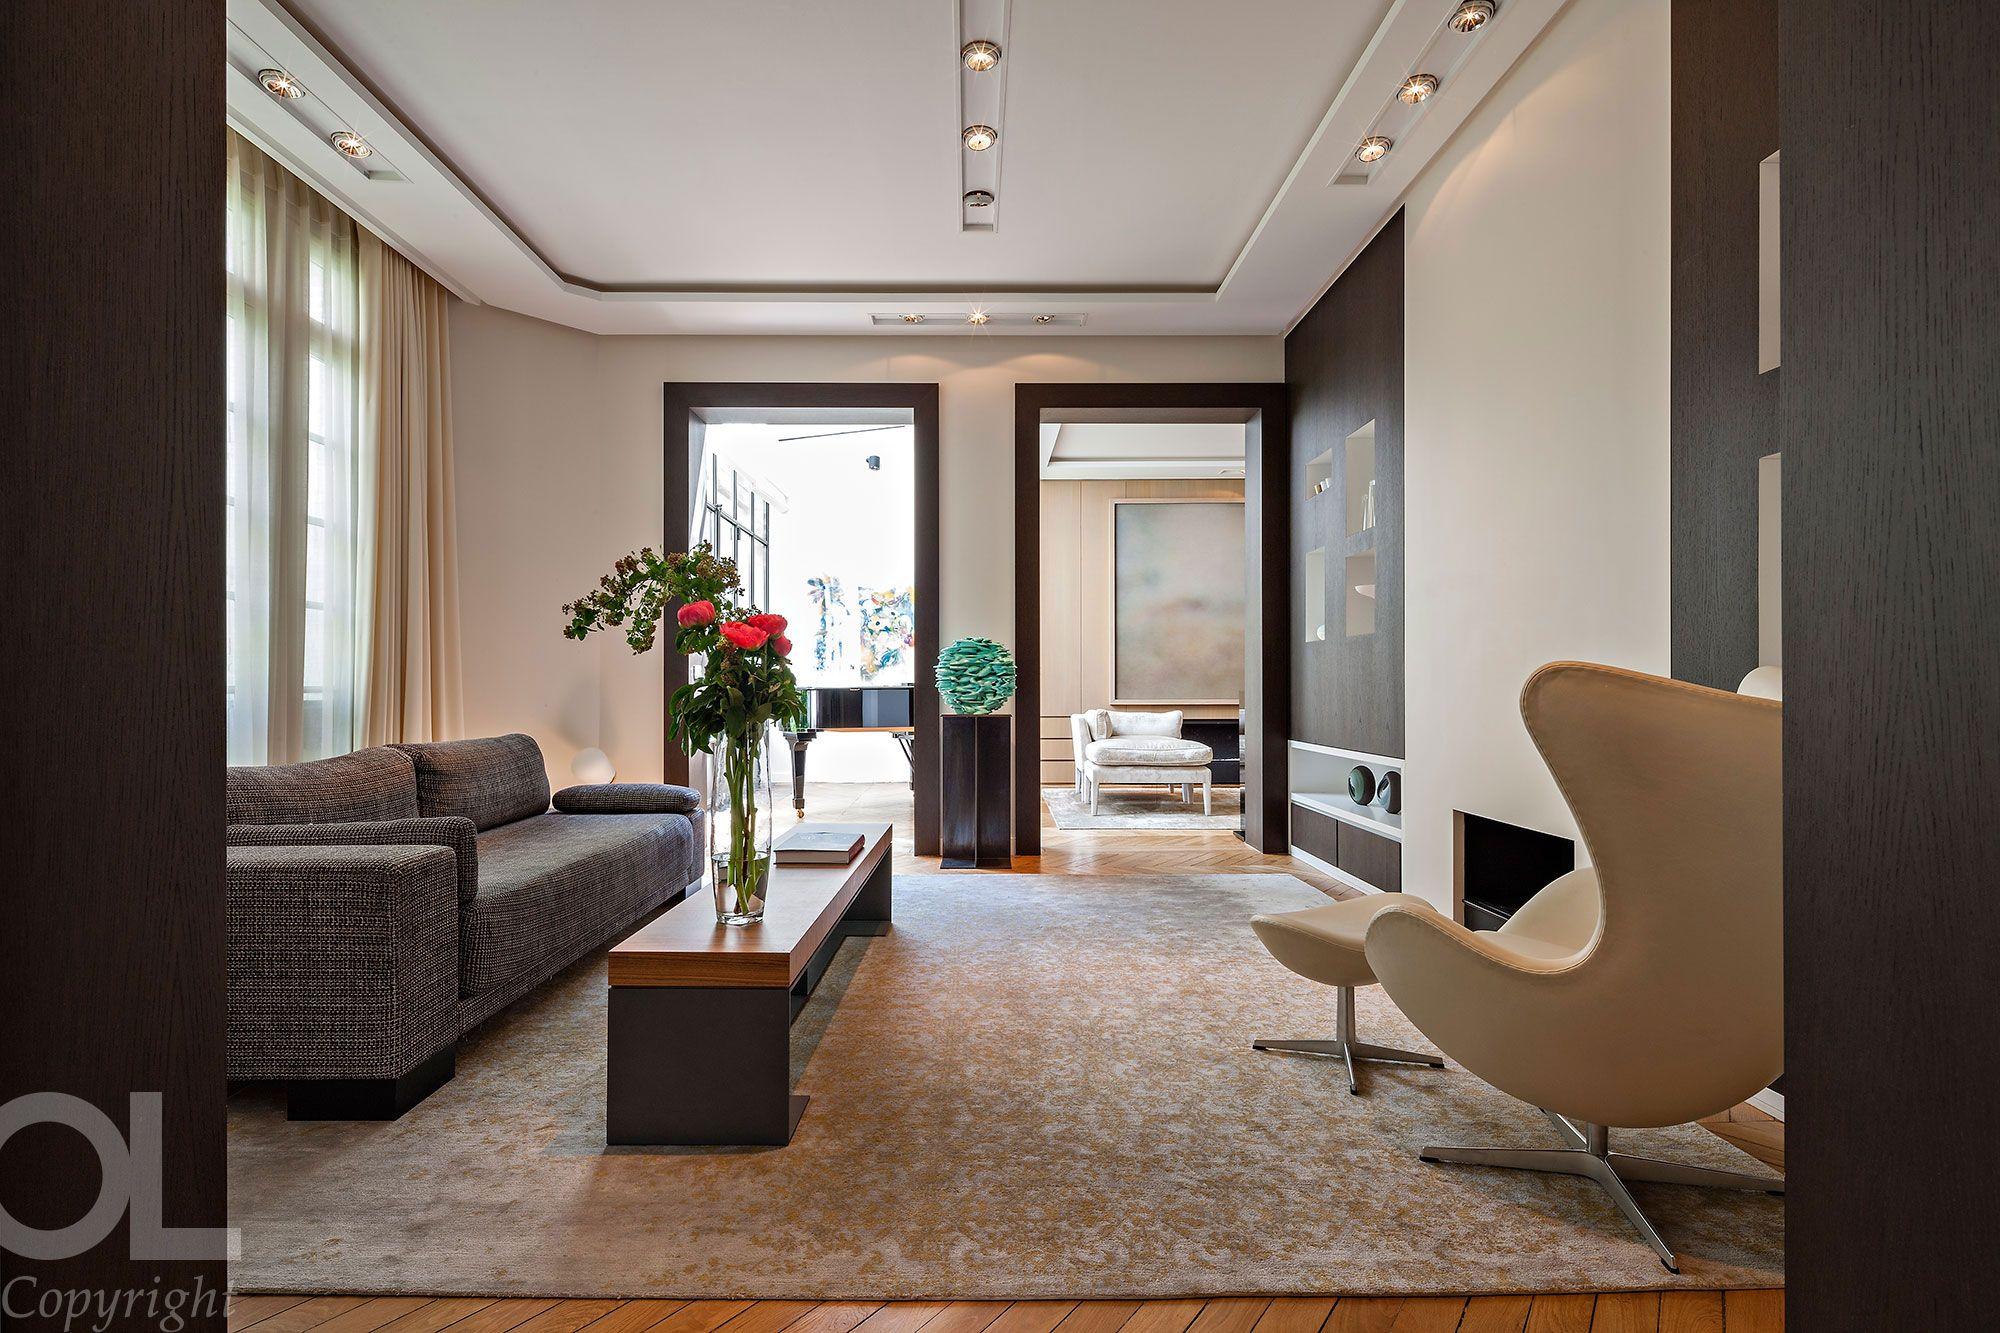 Prive Villa Maison Particuliere Hotel Particulier Invalides Helene Et Olivier Lempereur